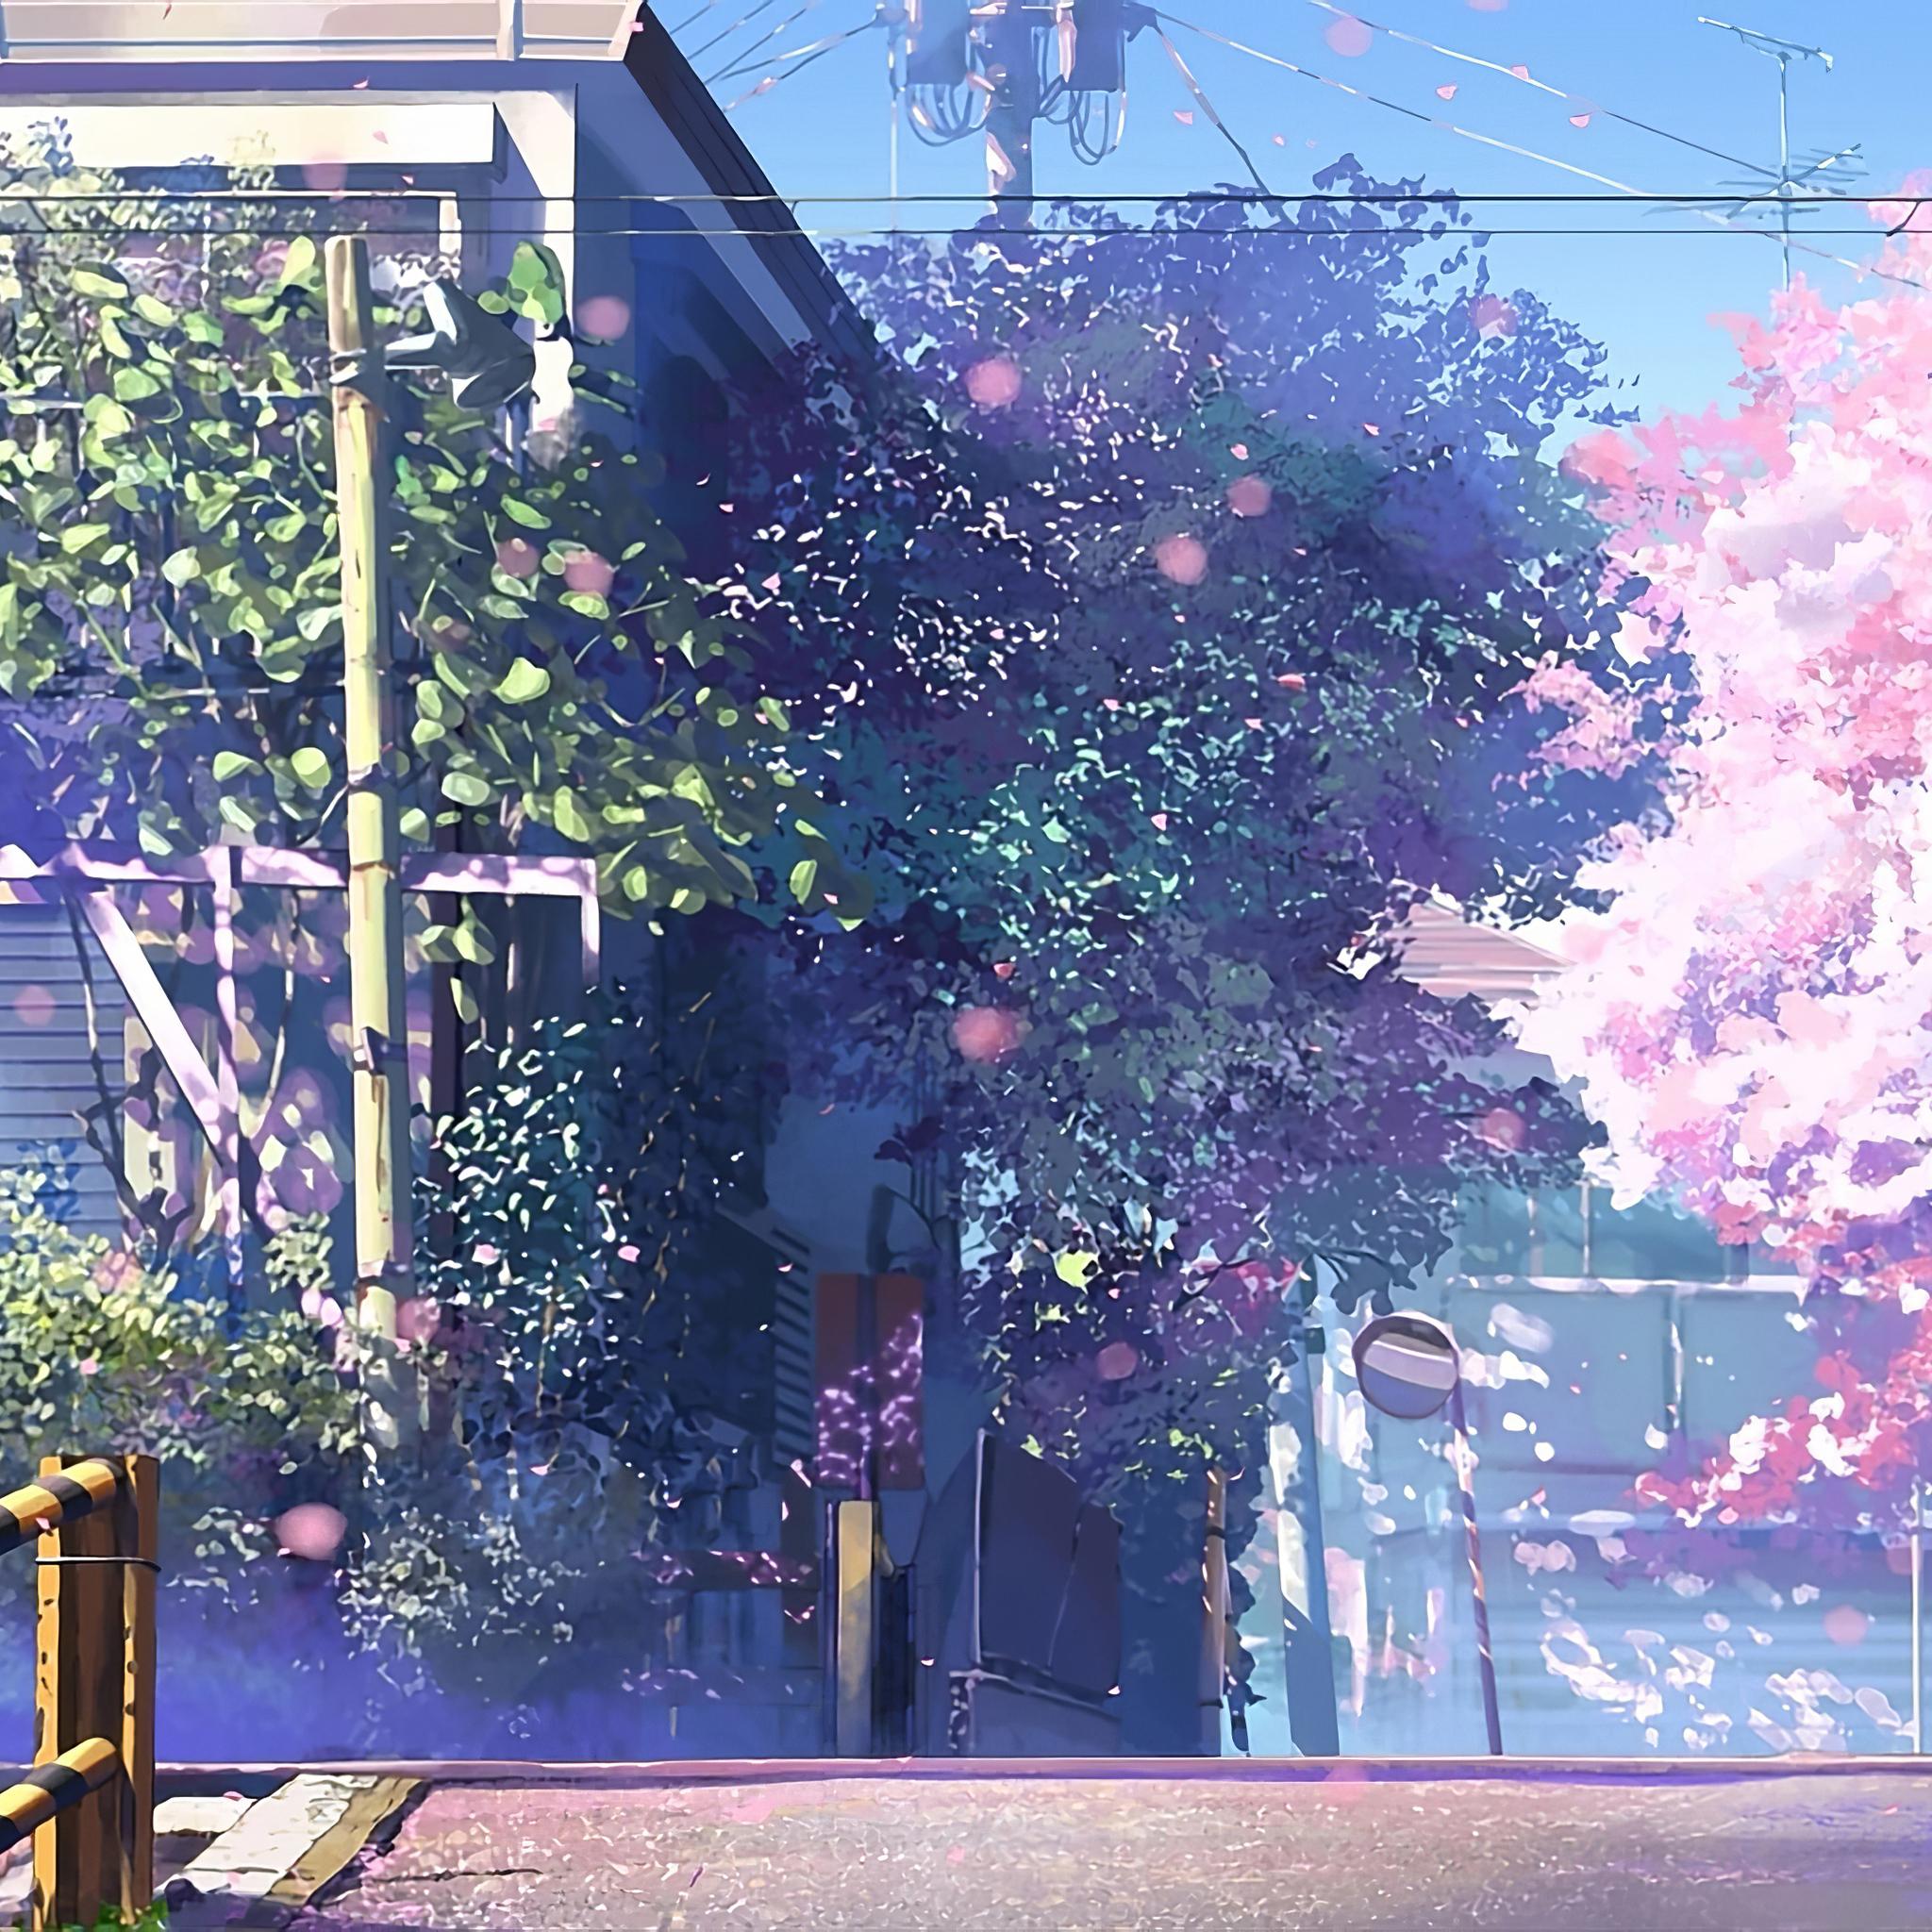 2048x2048 5 Centimeters Per Second Anime Tv Series 4k Ipad Air Hd